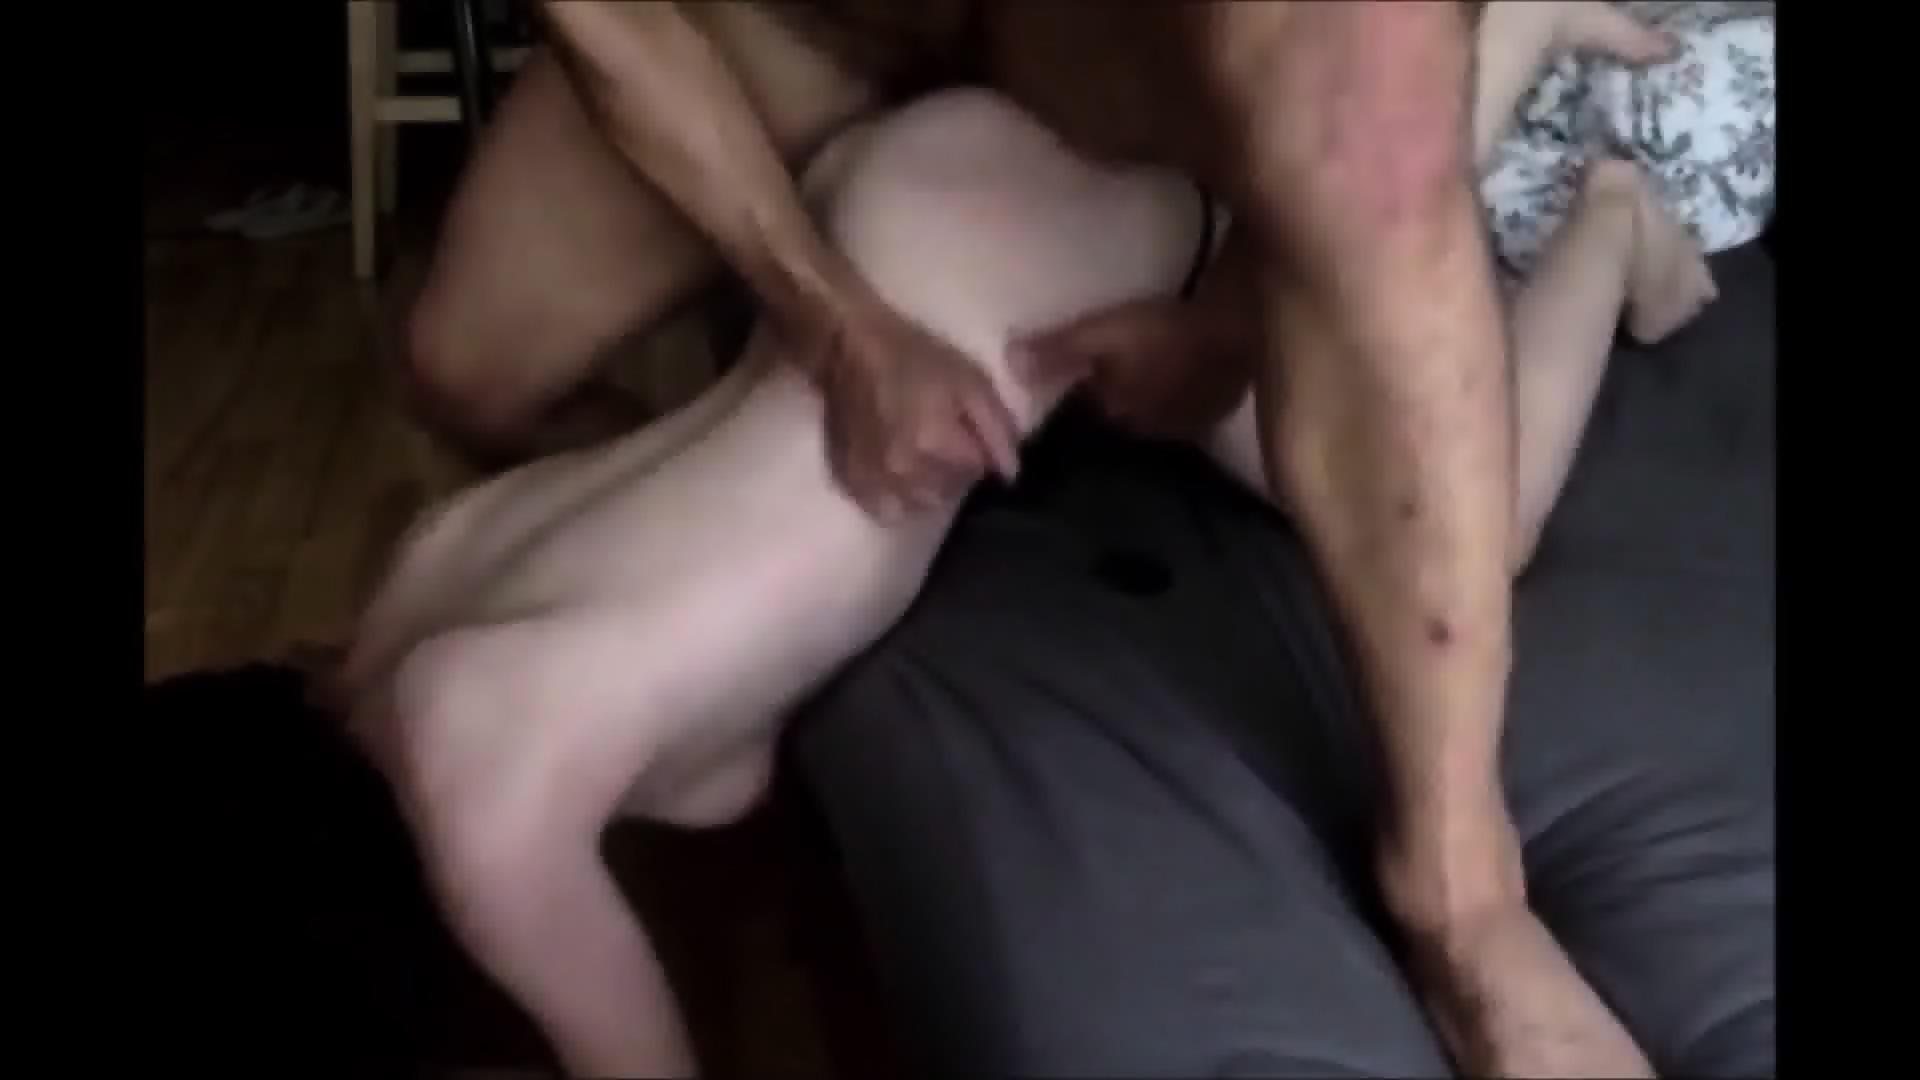 boring. ebony thai handjob cock cumshot know, how necessary act